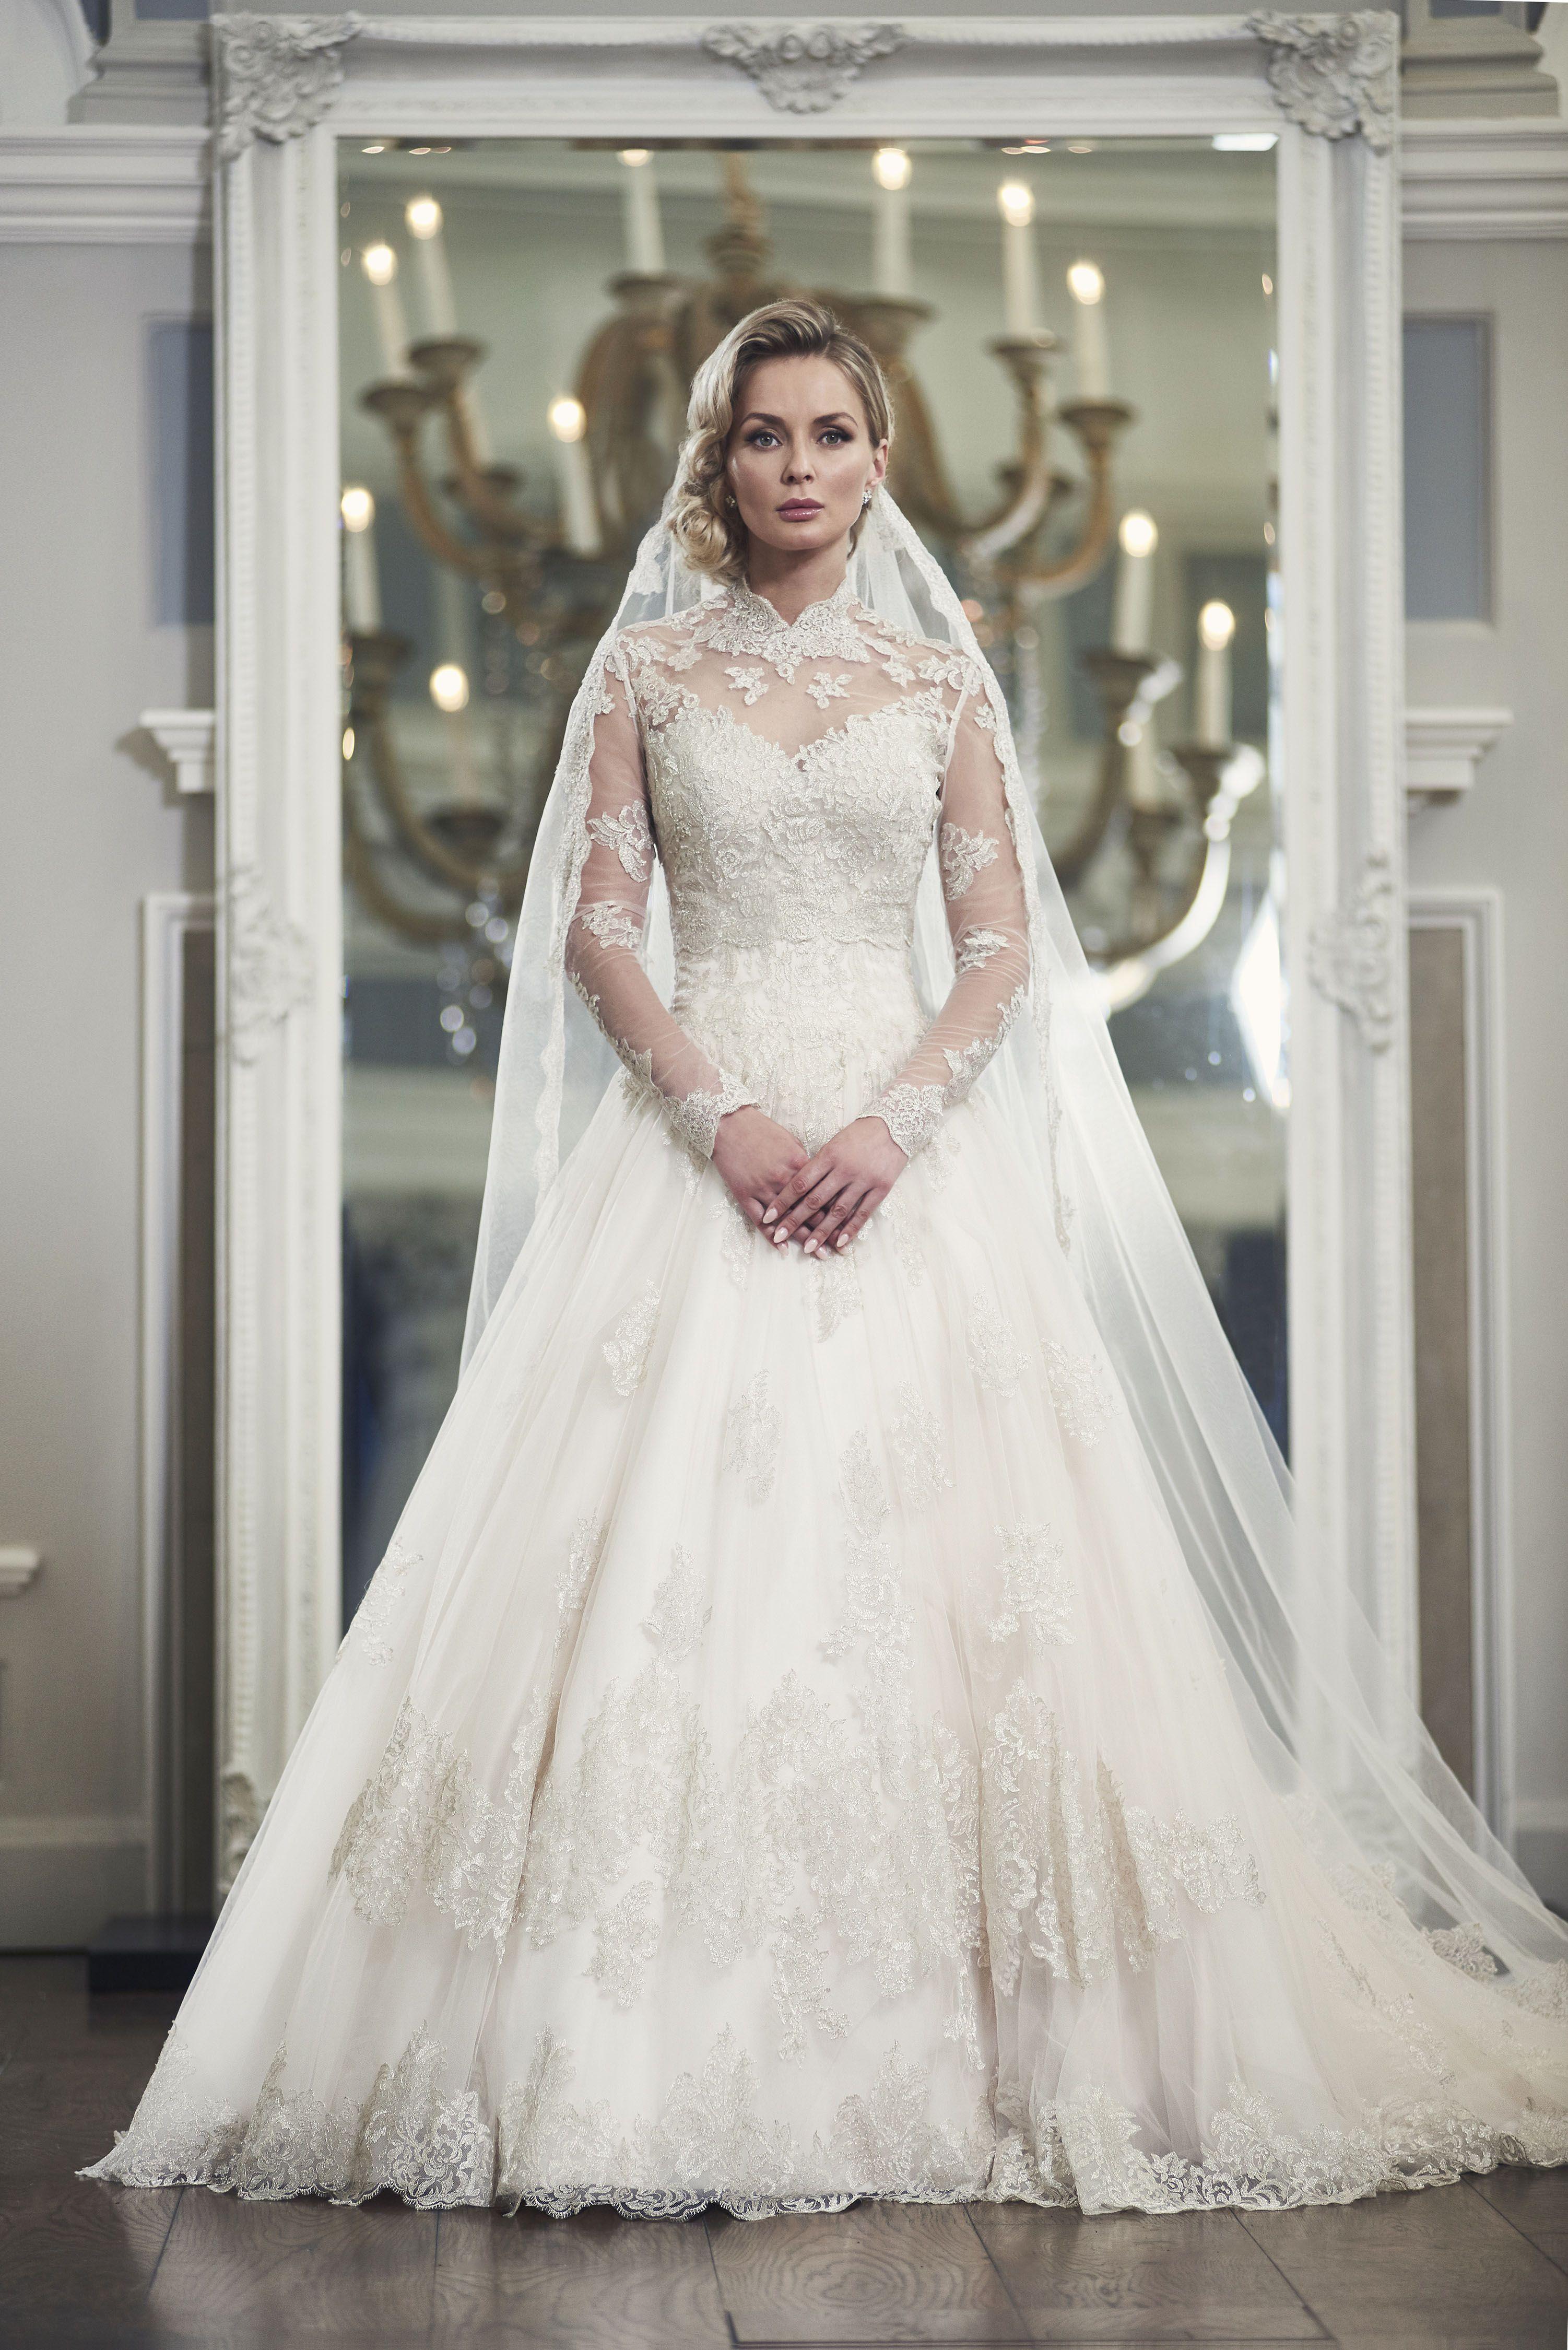 Grace Kelly Wedding Dress.Grace Kelly Inspired Wedding Dress Lace Full Skirt With Lace Bolero